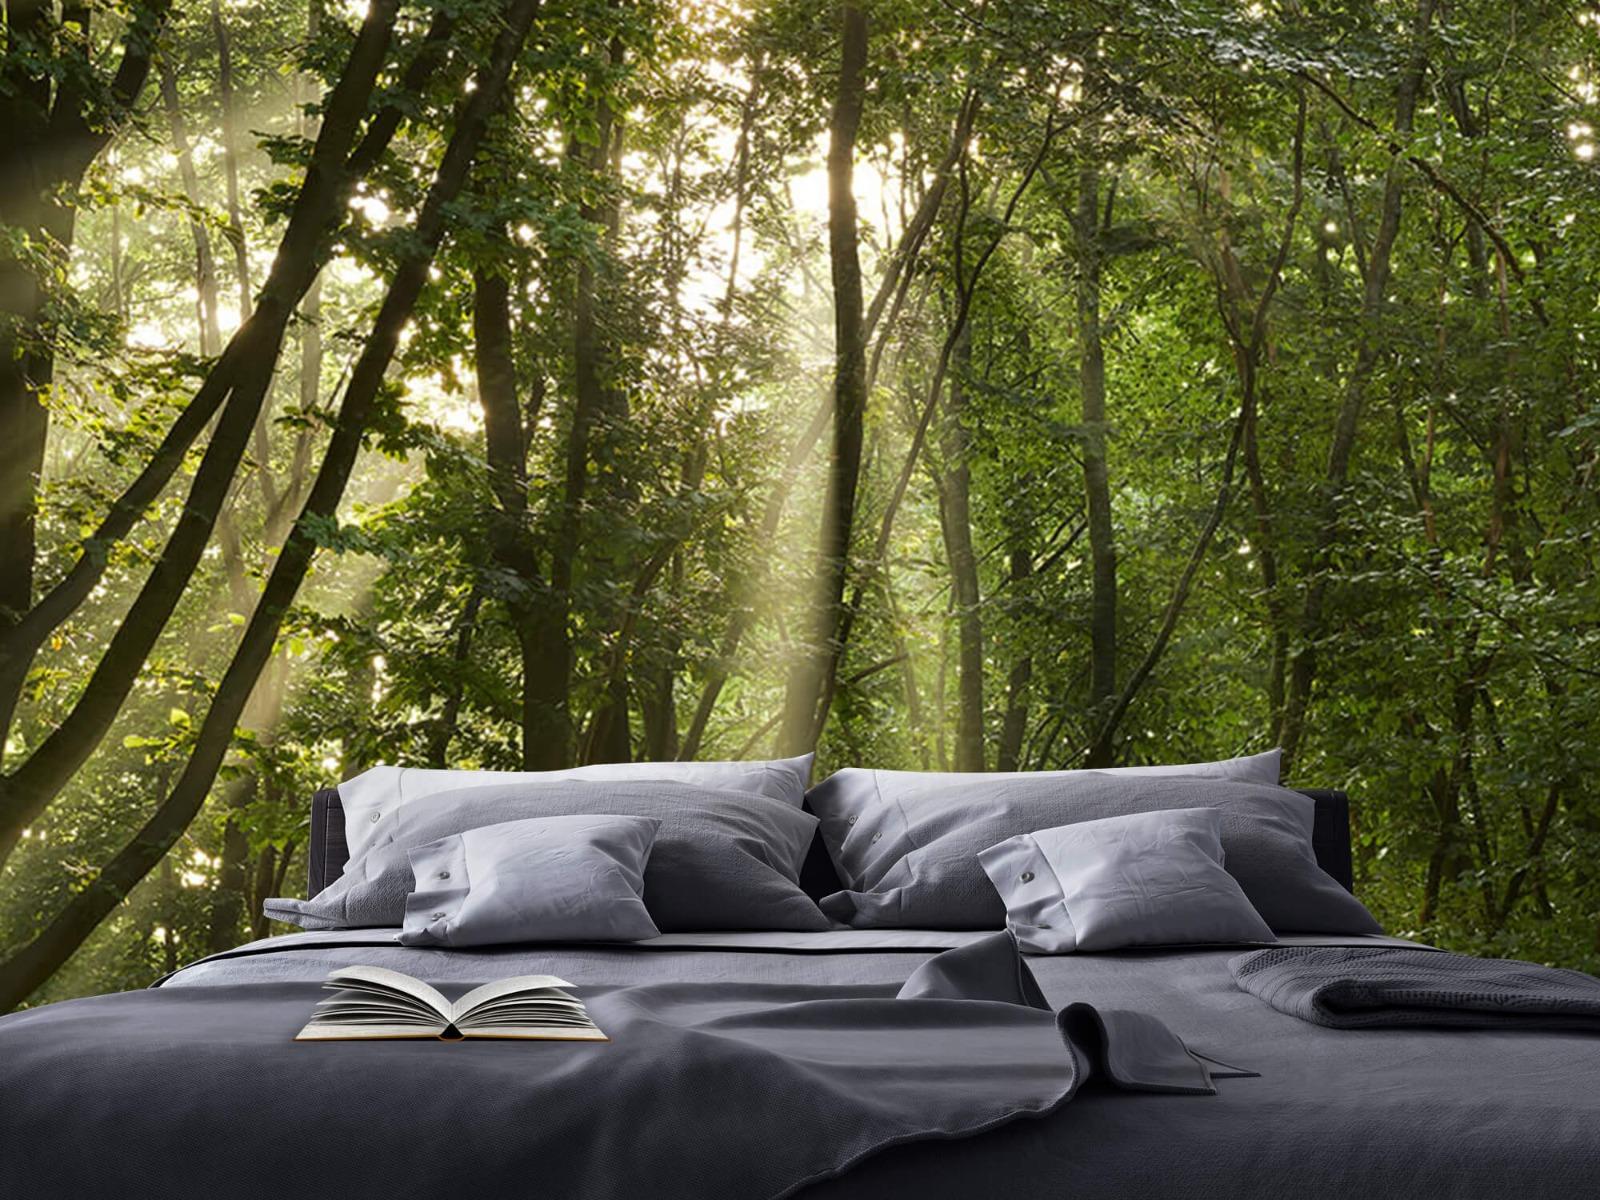 Bomen - Zonnestralen in het bos - Slaapkamer 17